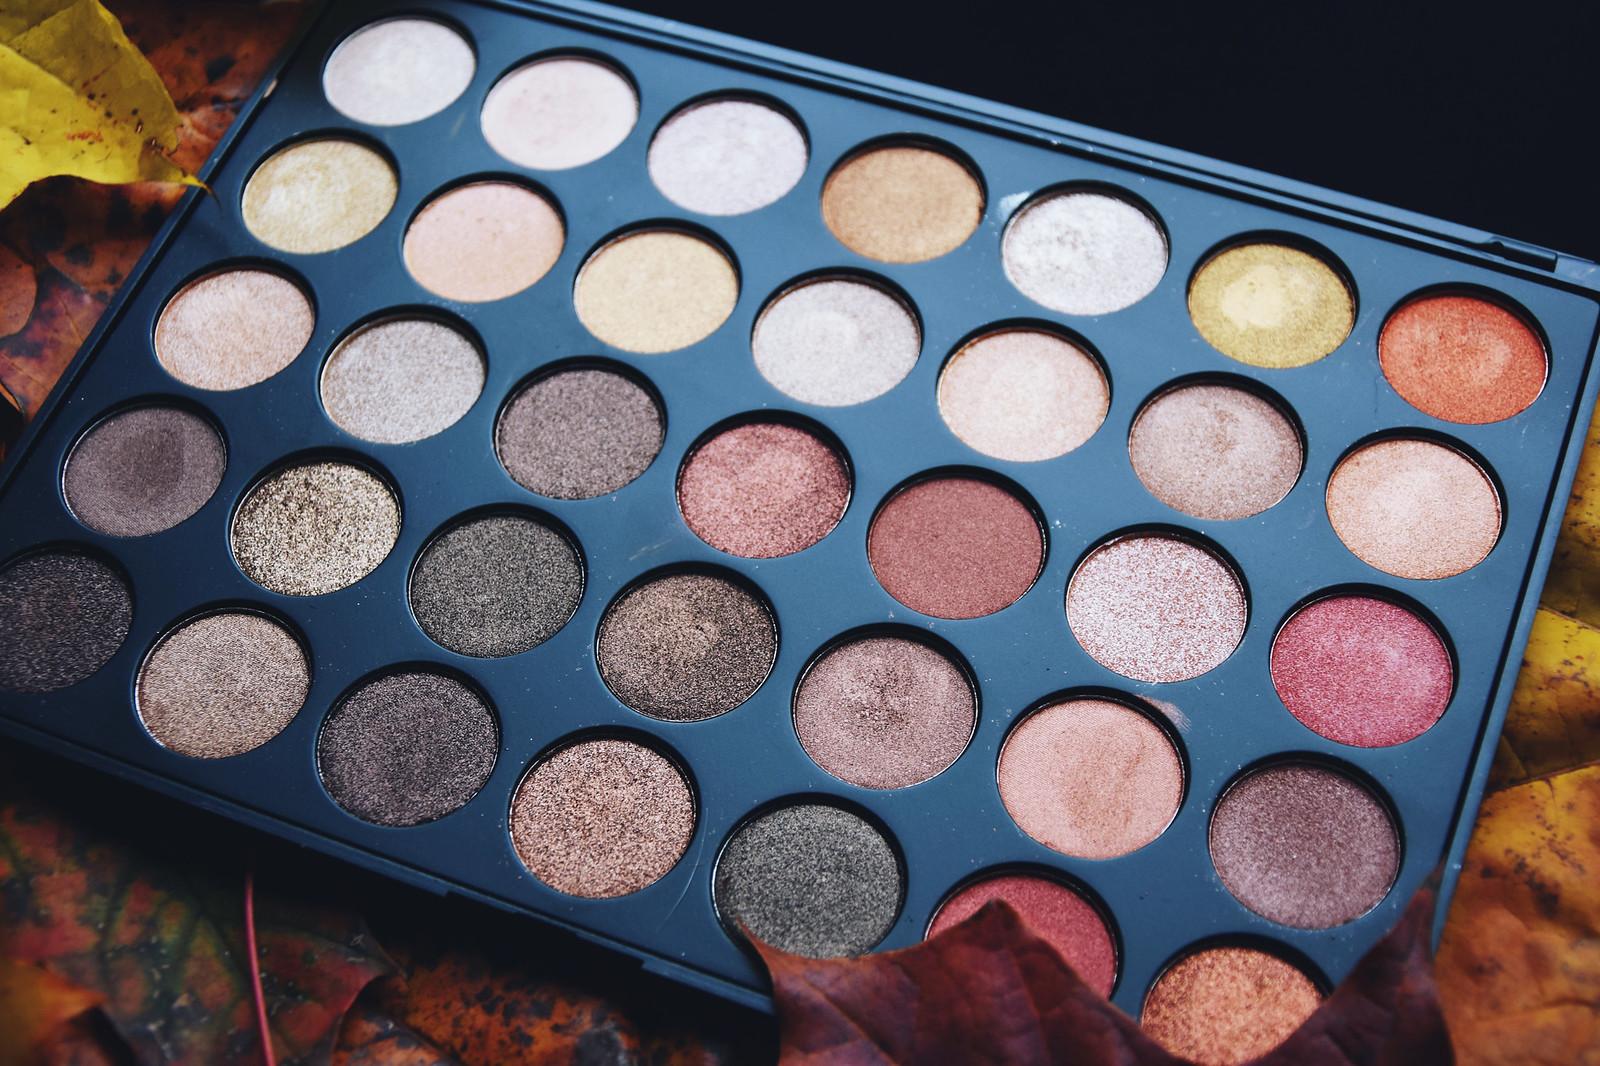 Morphe Brushes #35OS eyeshadow review